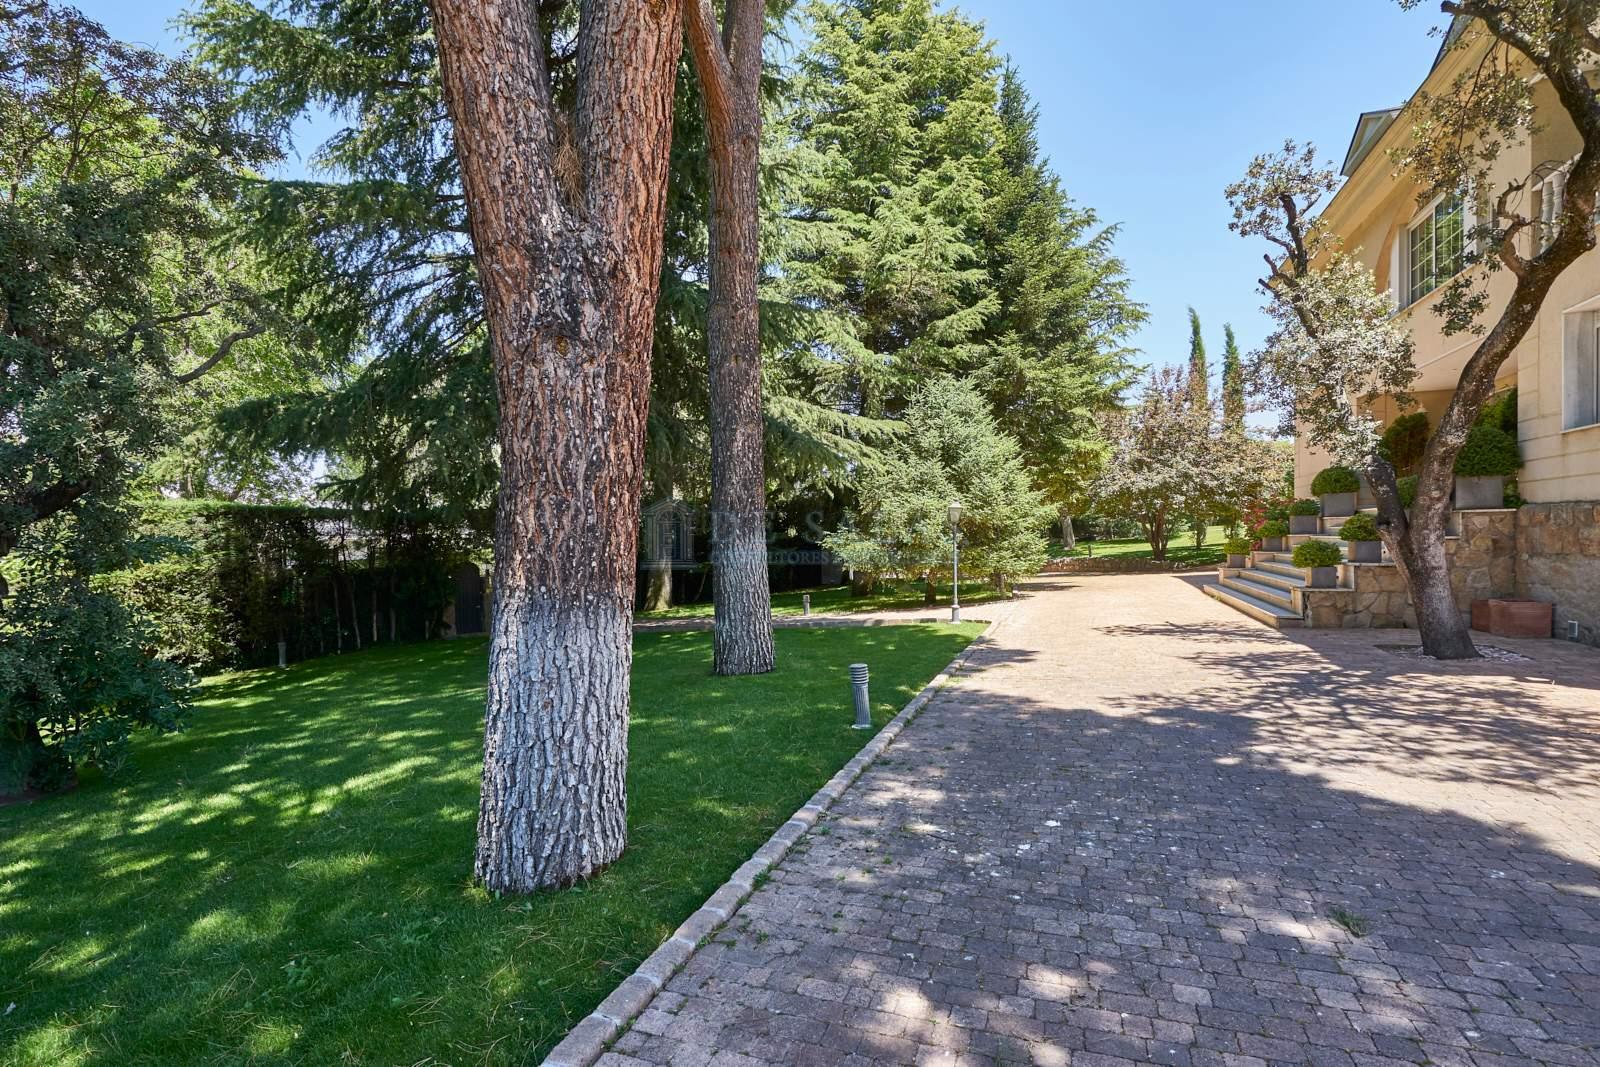 Jardín-0020 Chalet La Moraleja